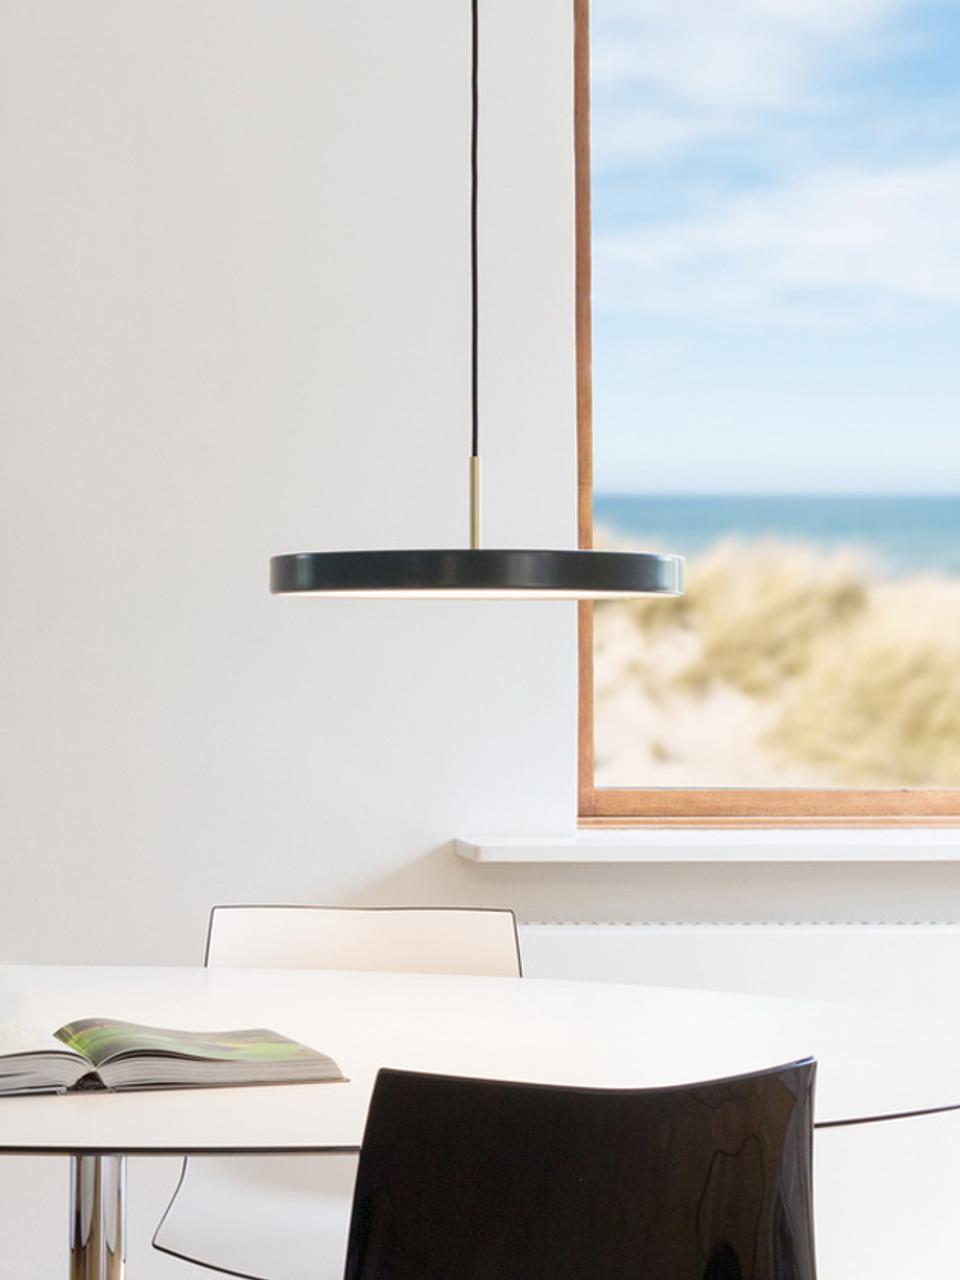 Designové zavěsné LED svítidlo Asteria, Antracitová